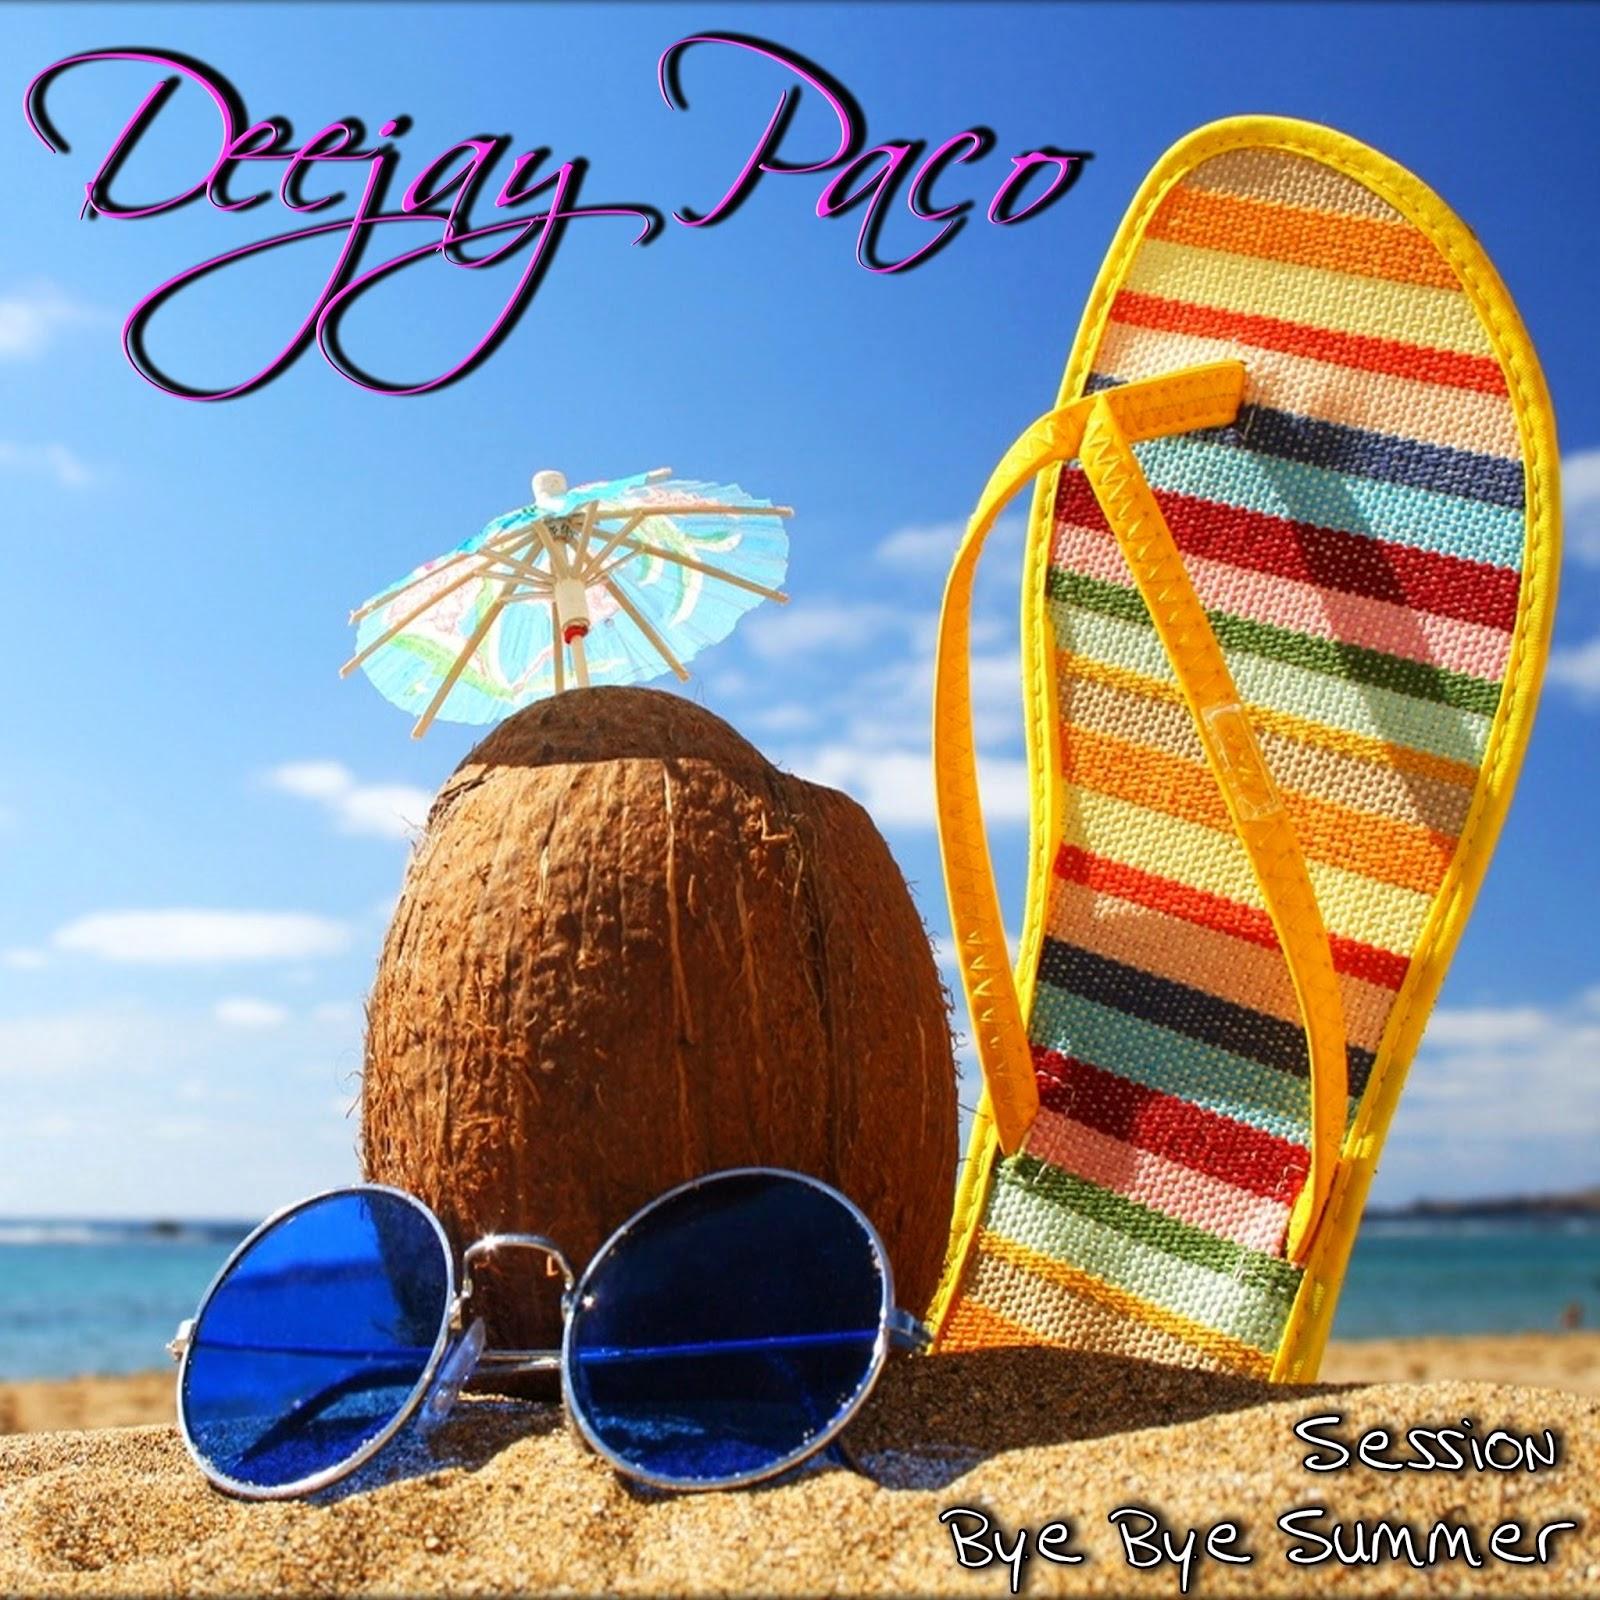 http://www.mediafire.com/download/1v92rbkbj7vc08s/Deejay+Paco+Bye+Bye+Summer+2013.rar